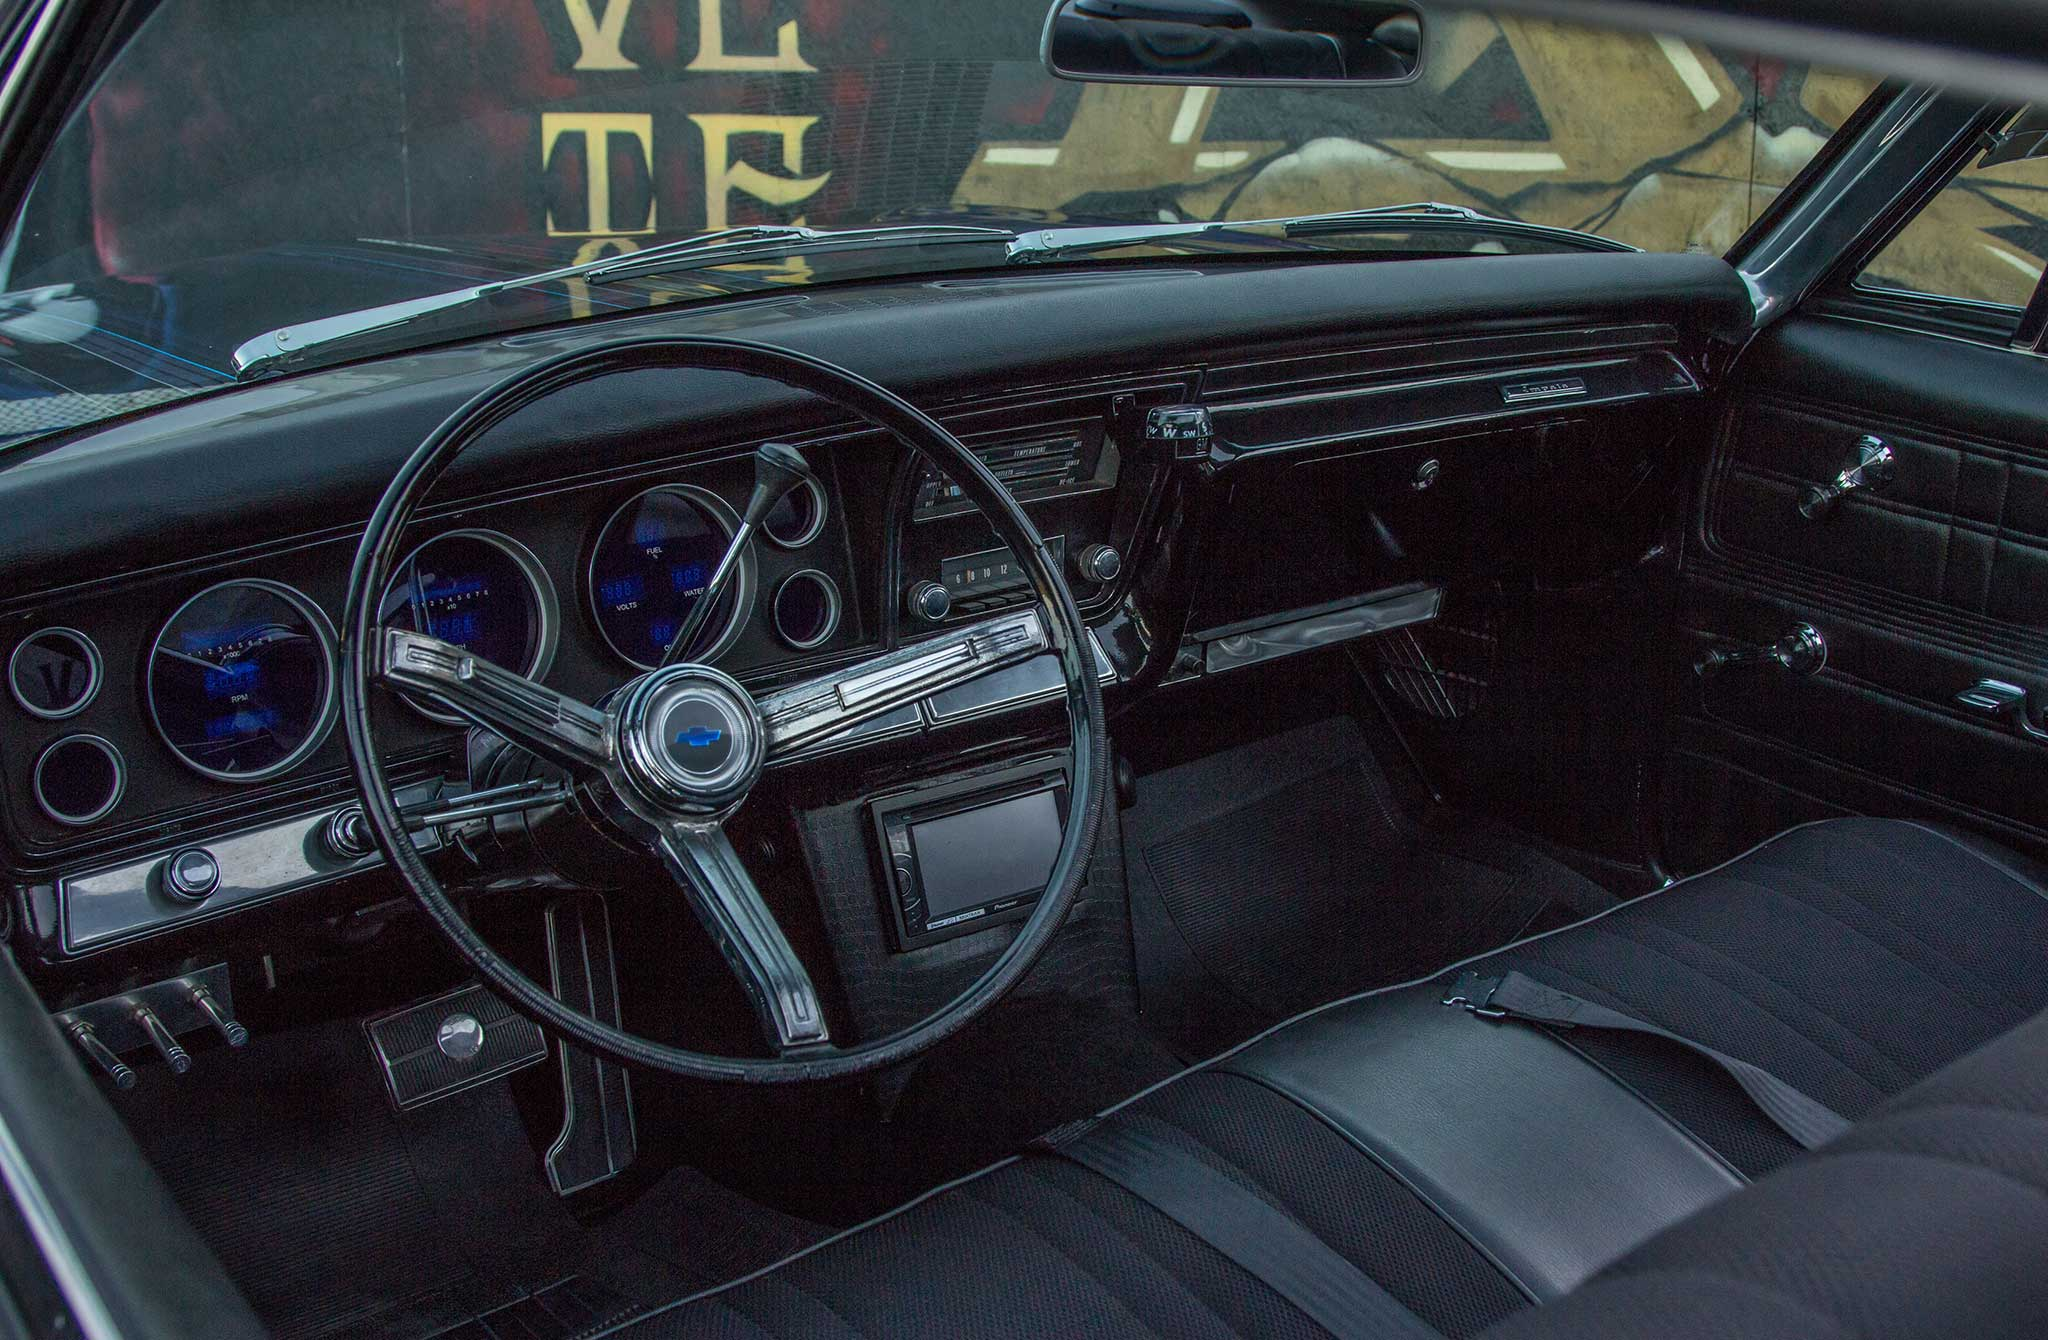 1967 chevrolet impala steering wheel 023